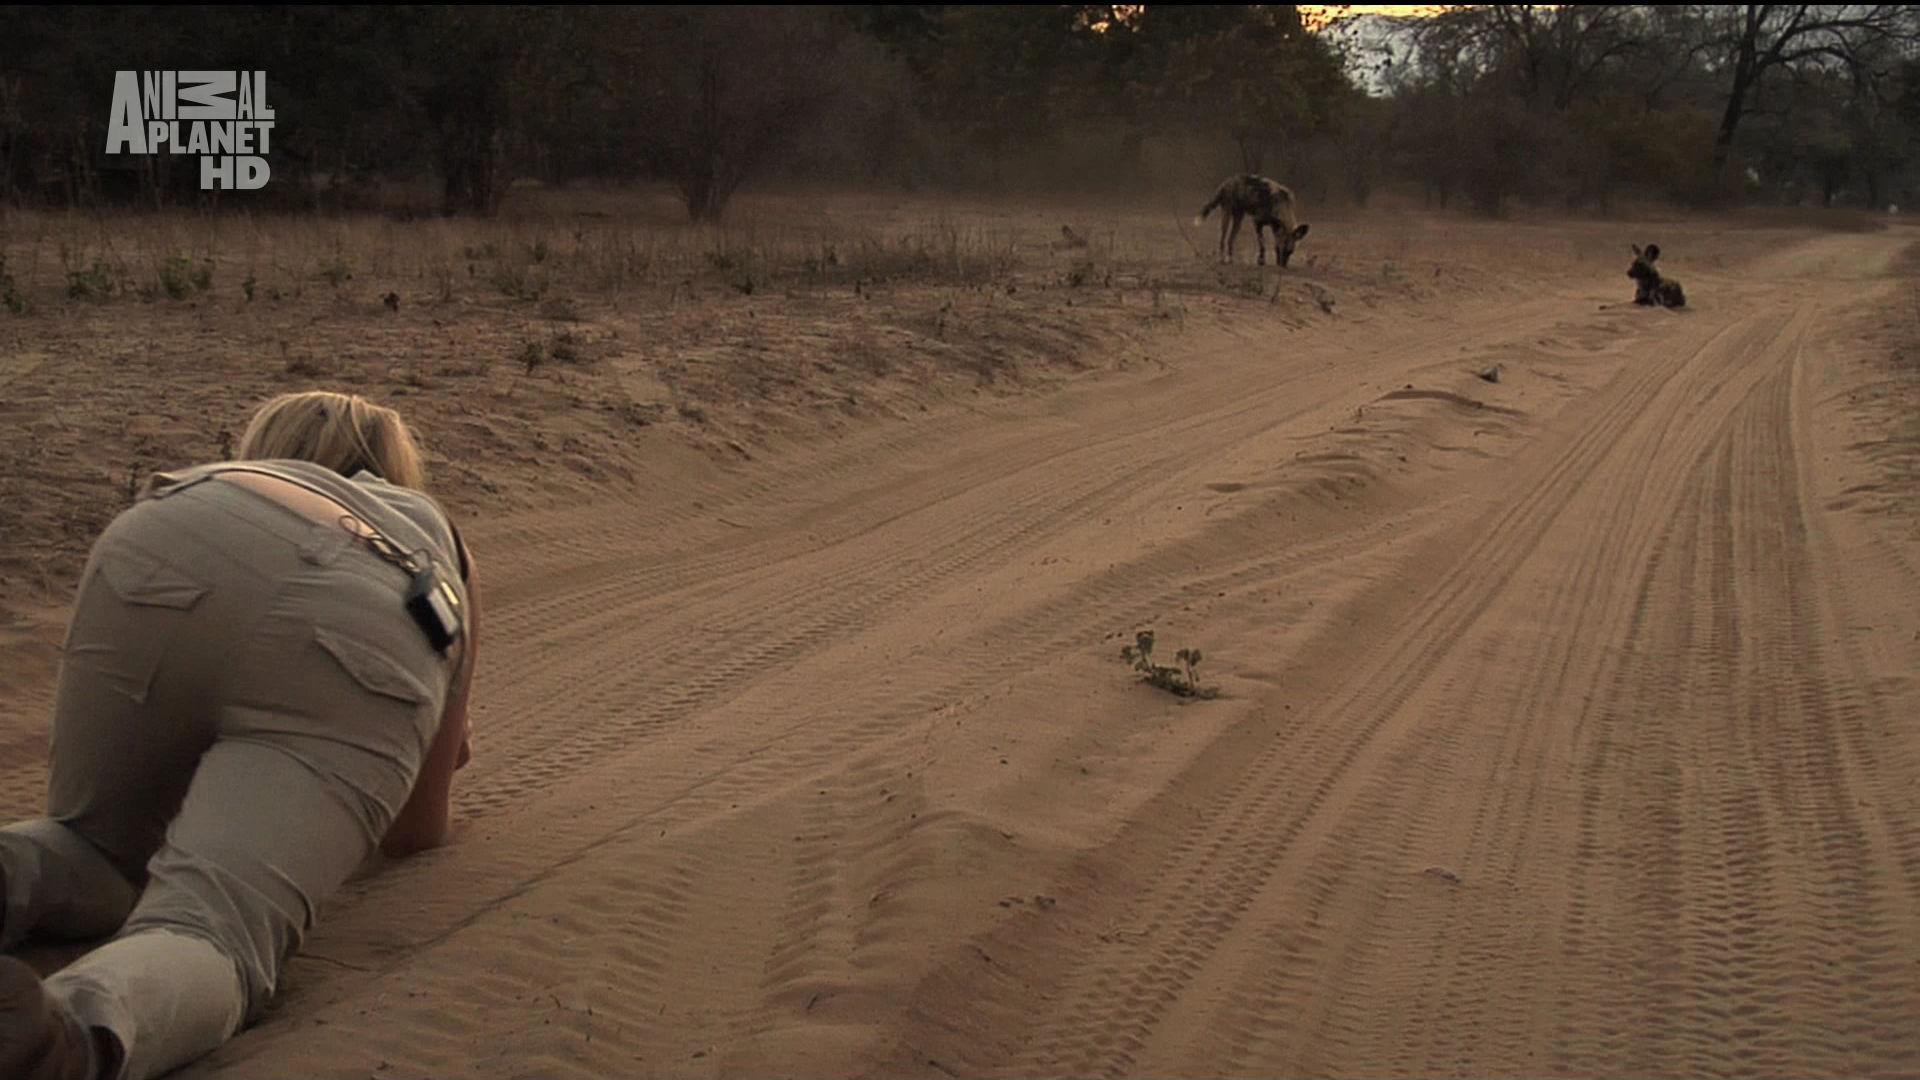 Karina - Wild on Safari - S01E02